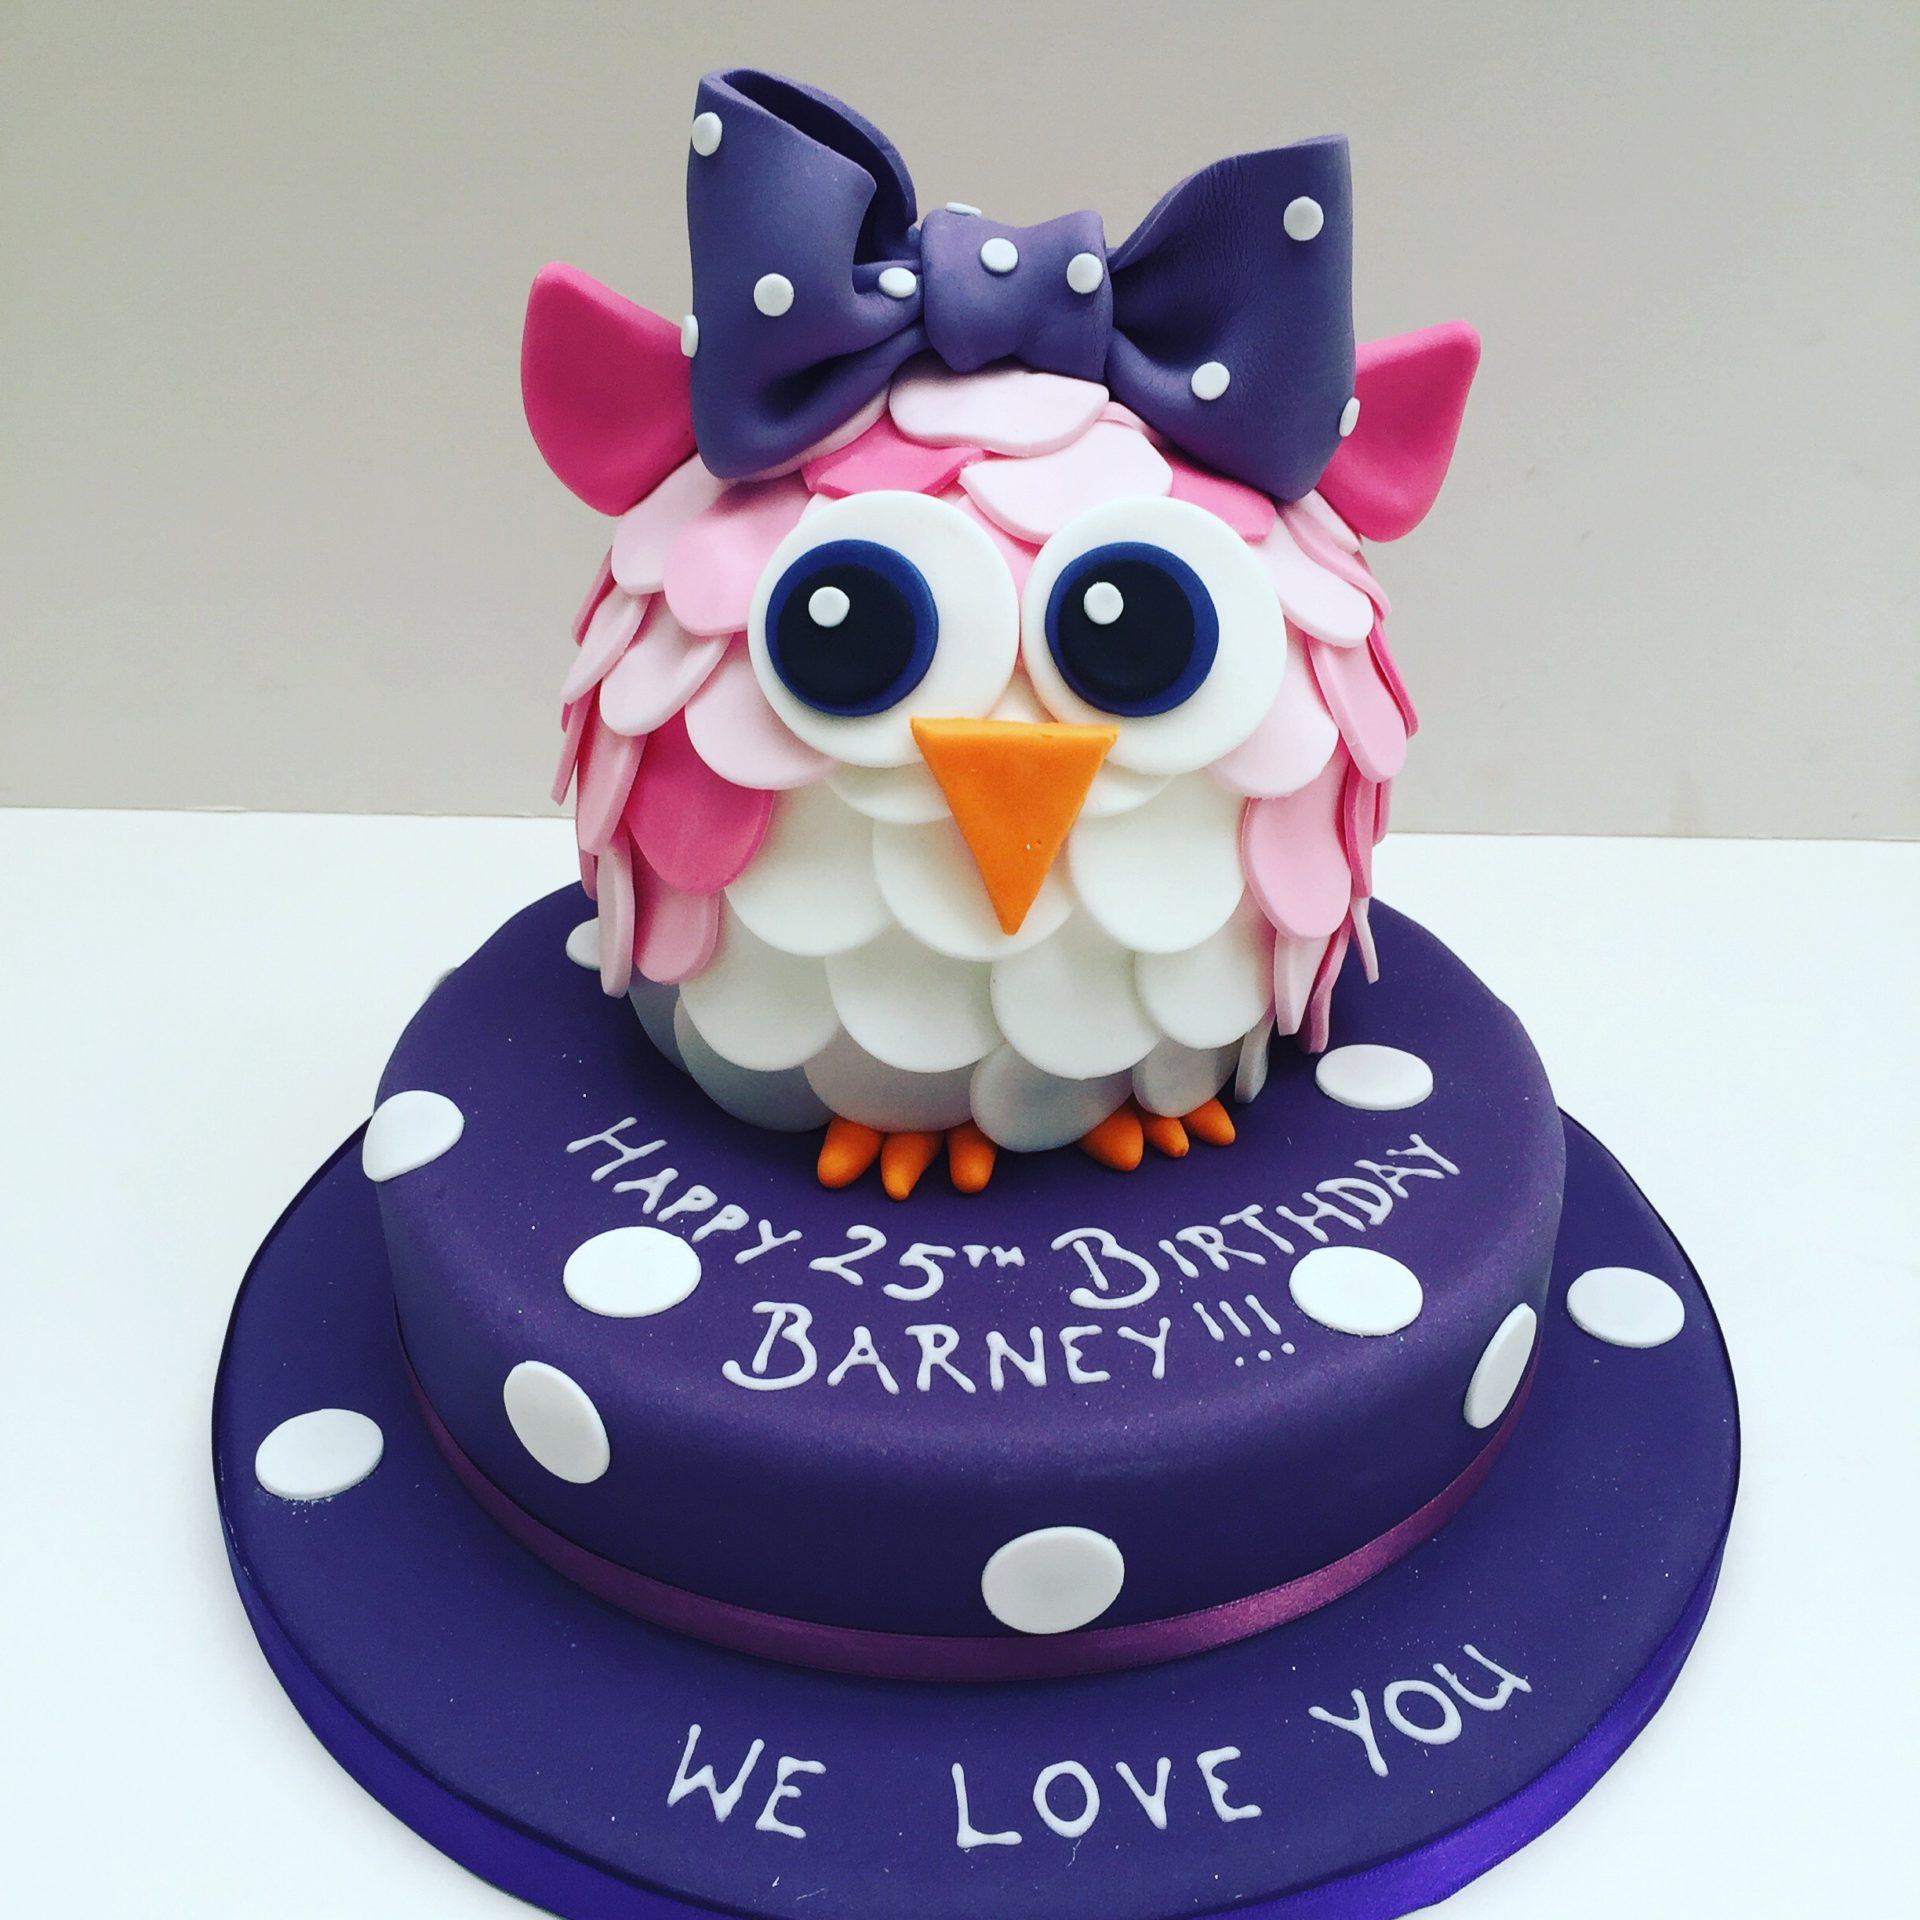 Sensational Owl Cake Etoile Bakery Funny Birthday Cards Online Fluifree Goldxyz